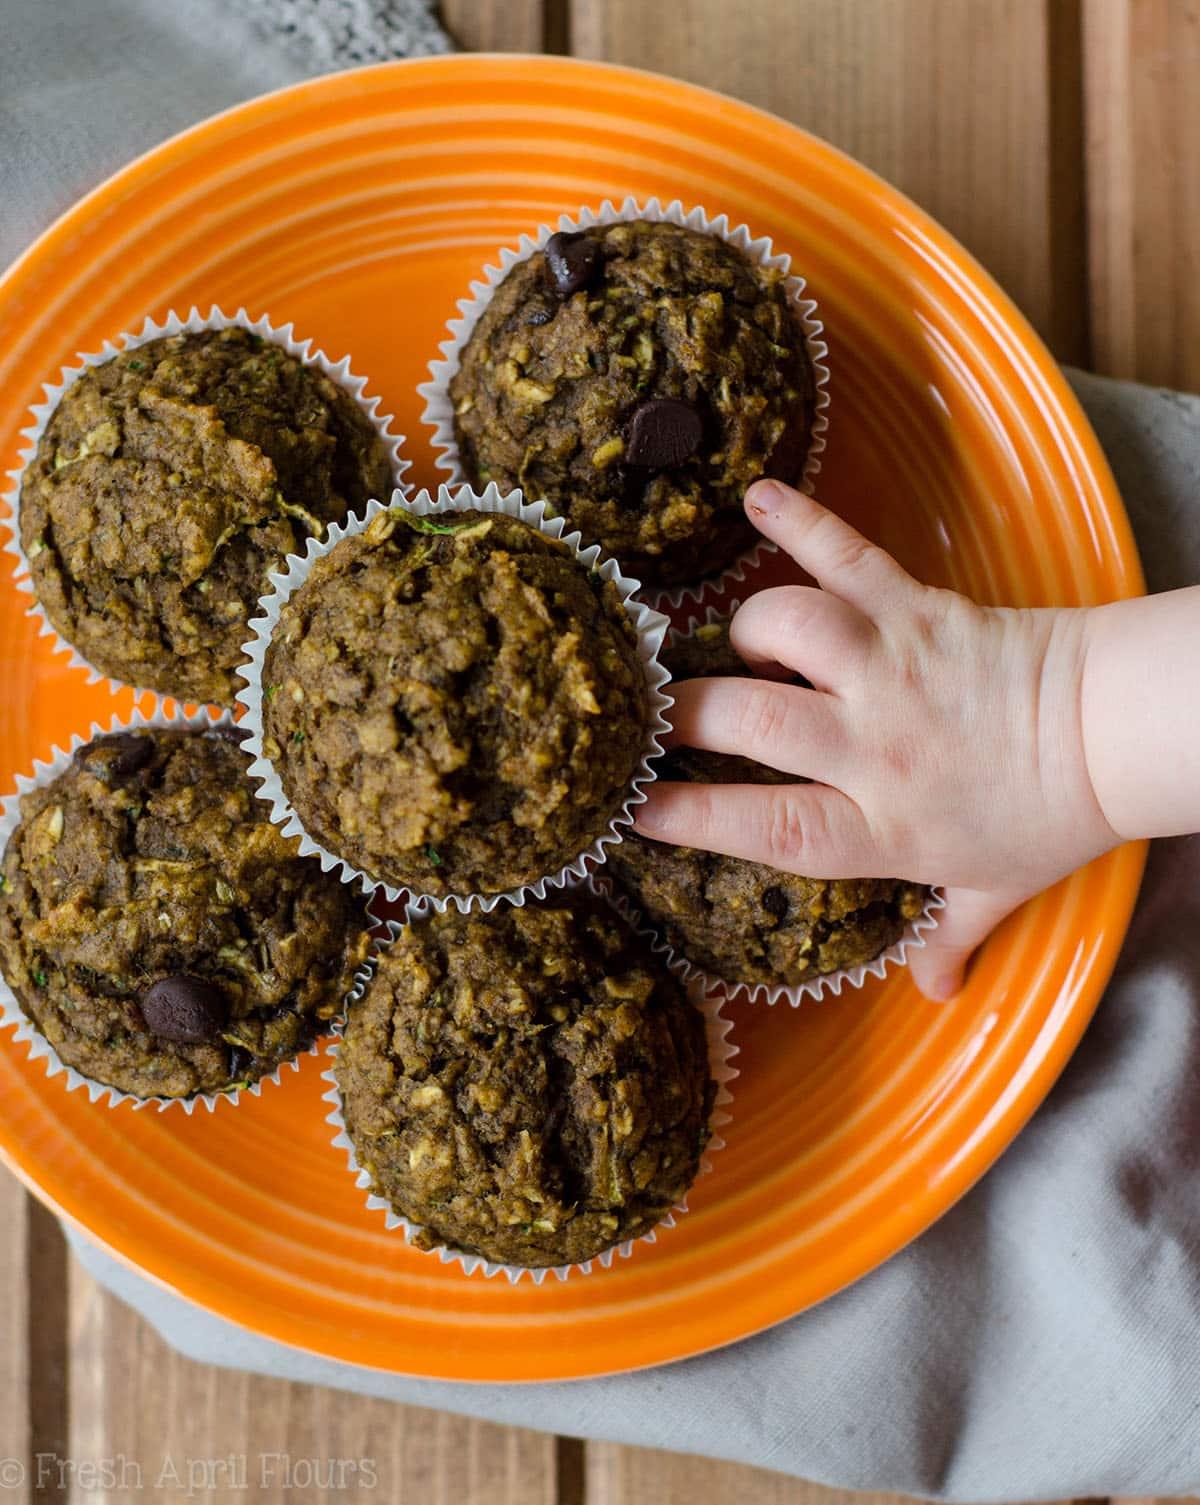 toddler hand grabbing a toddler muffin